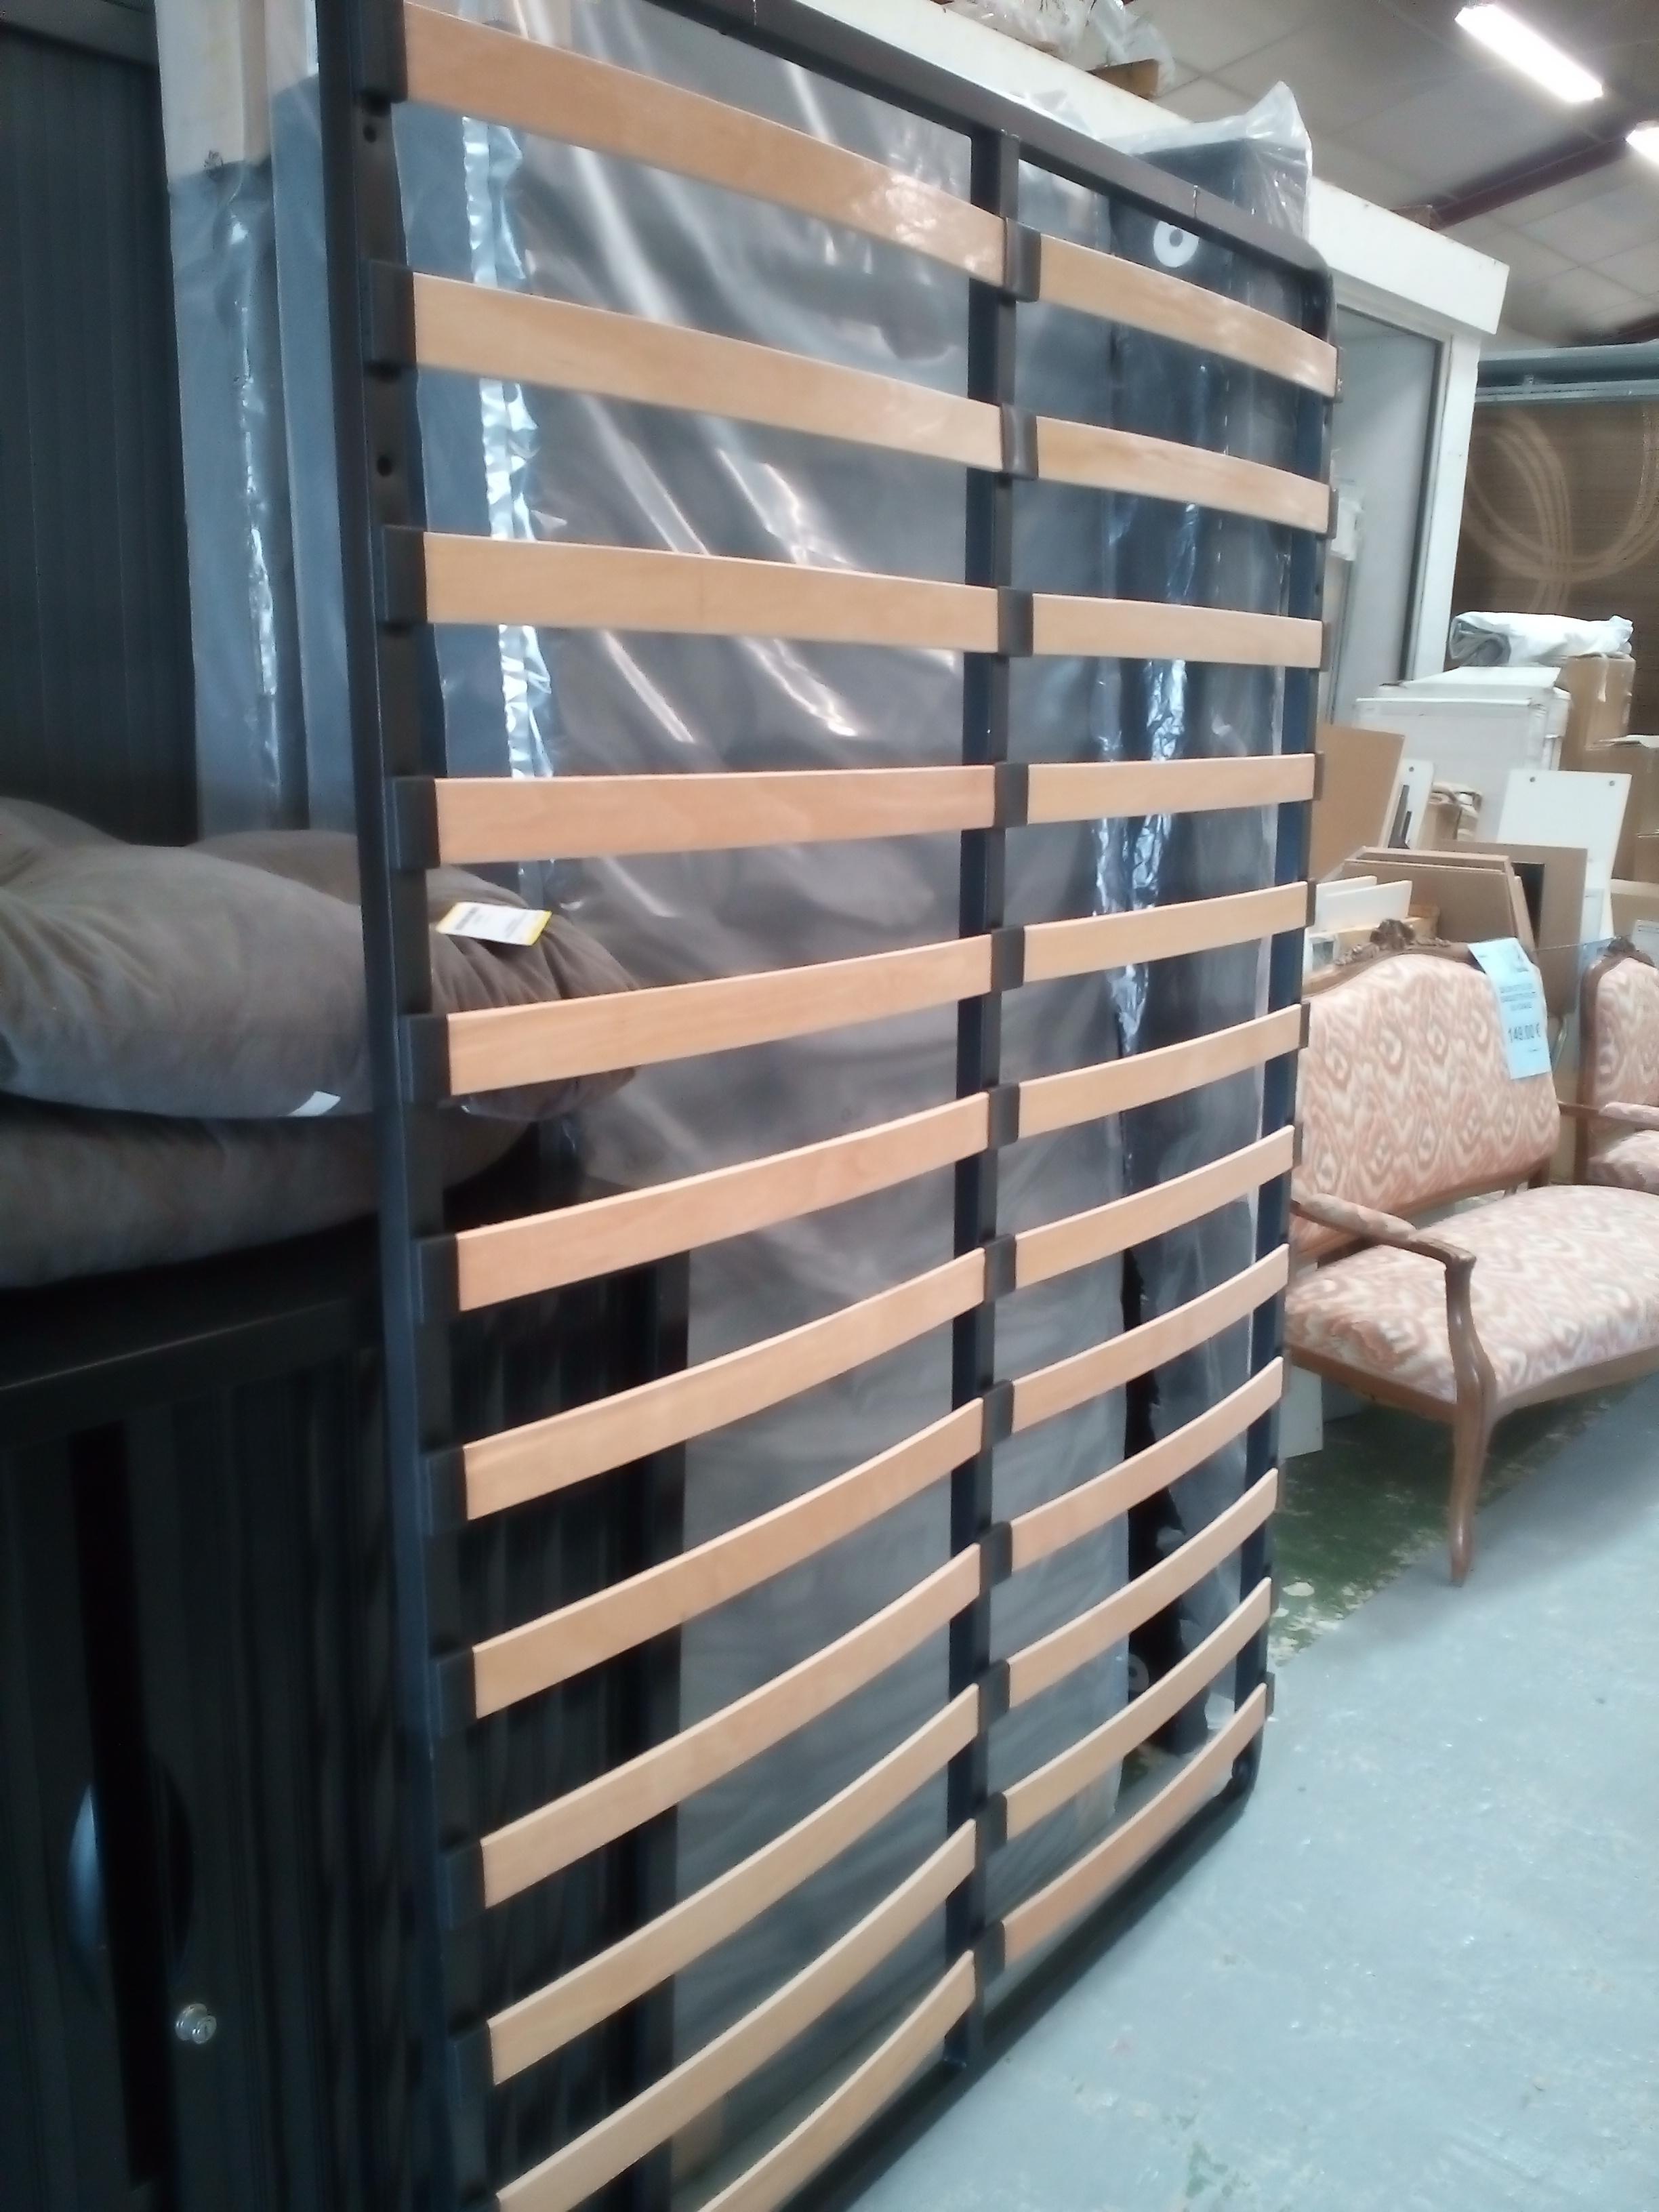 cadre lattes simple 140x190 occasion la cabane du troc. Black Bedroom Furniture Sets. Home Design Ideas